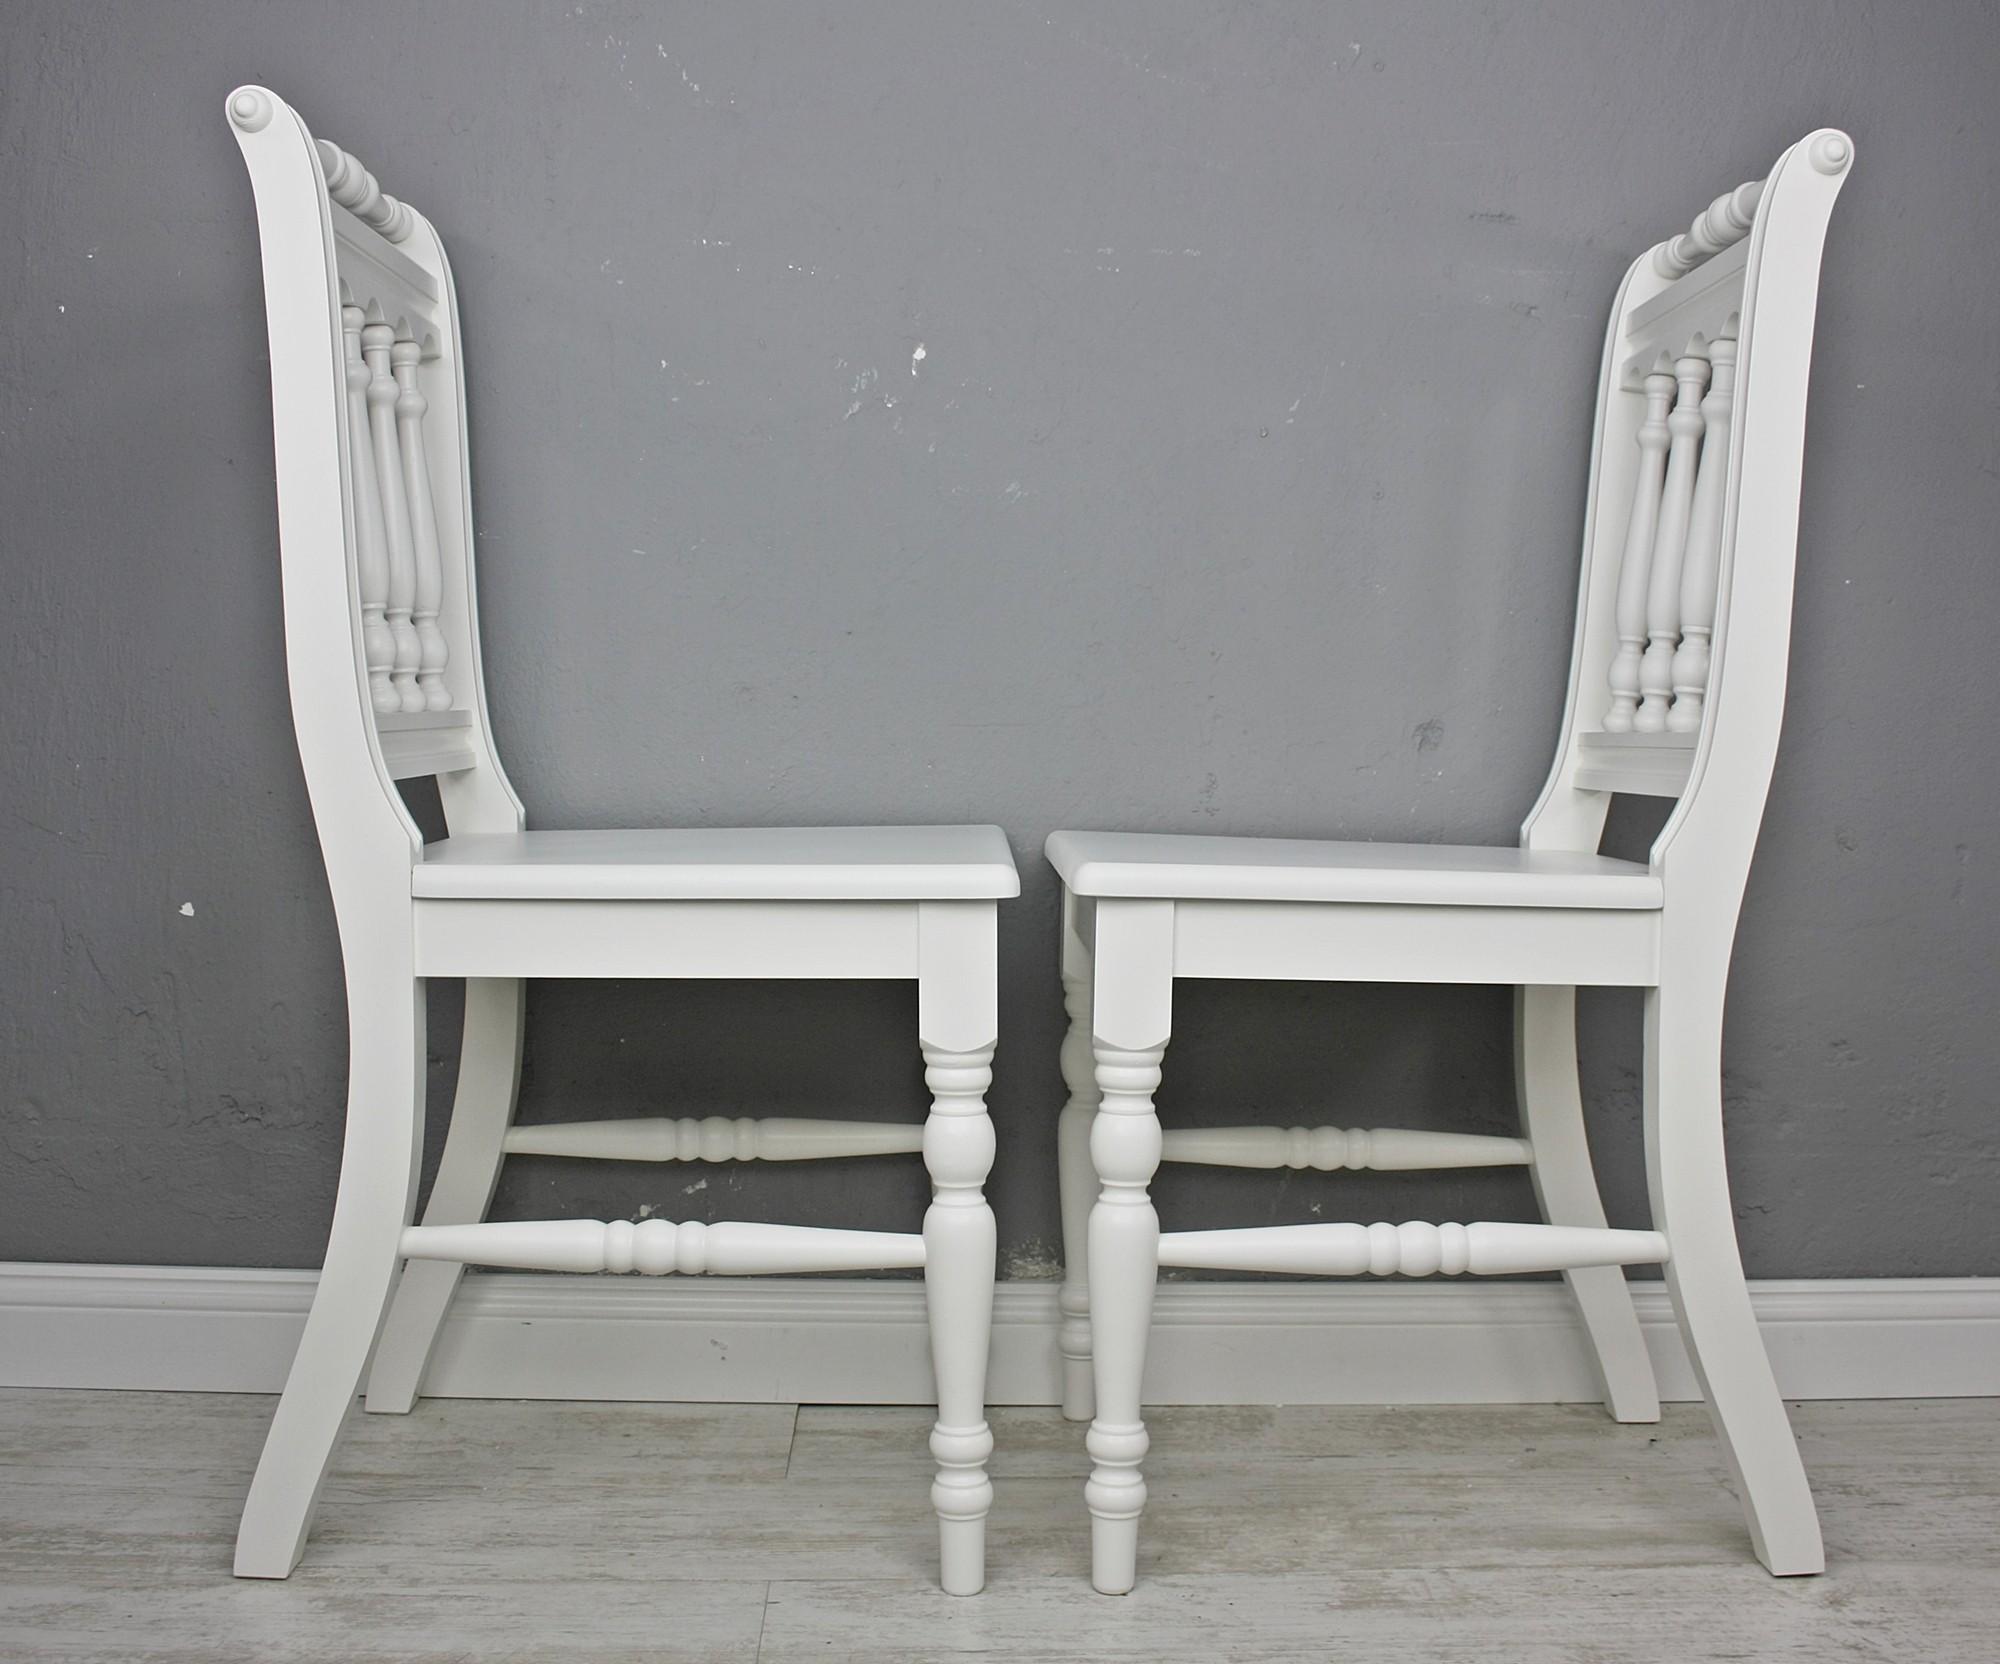 2x stuhl holzstuhl k chenstuhl otto massiv wei vollholz. Black Bedroom Furniture Sets. Home Design Ideas